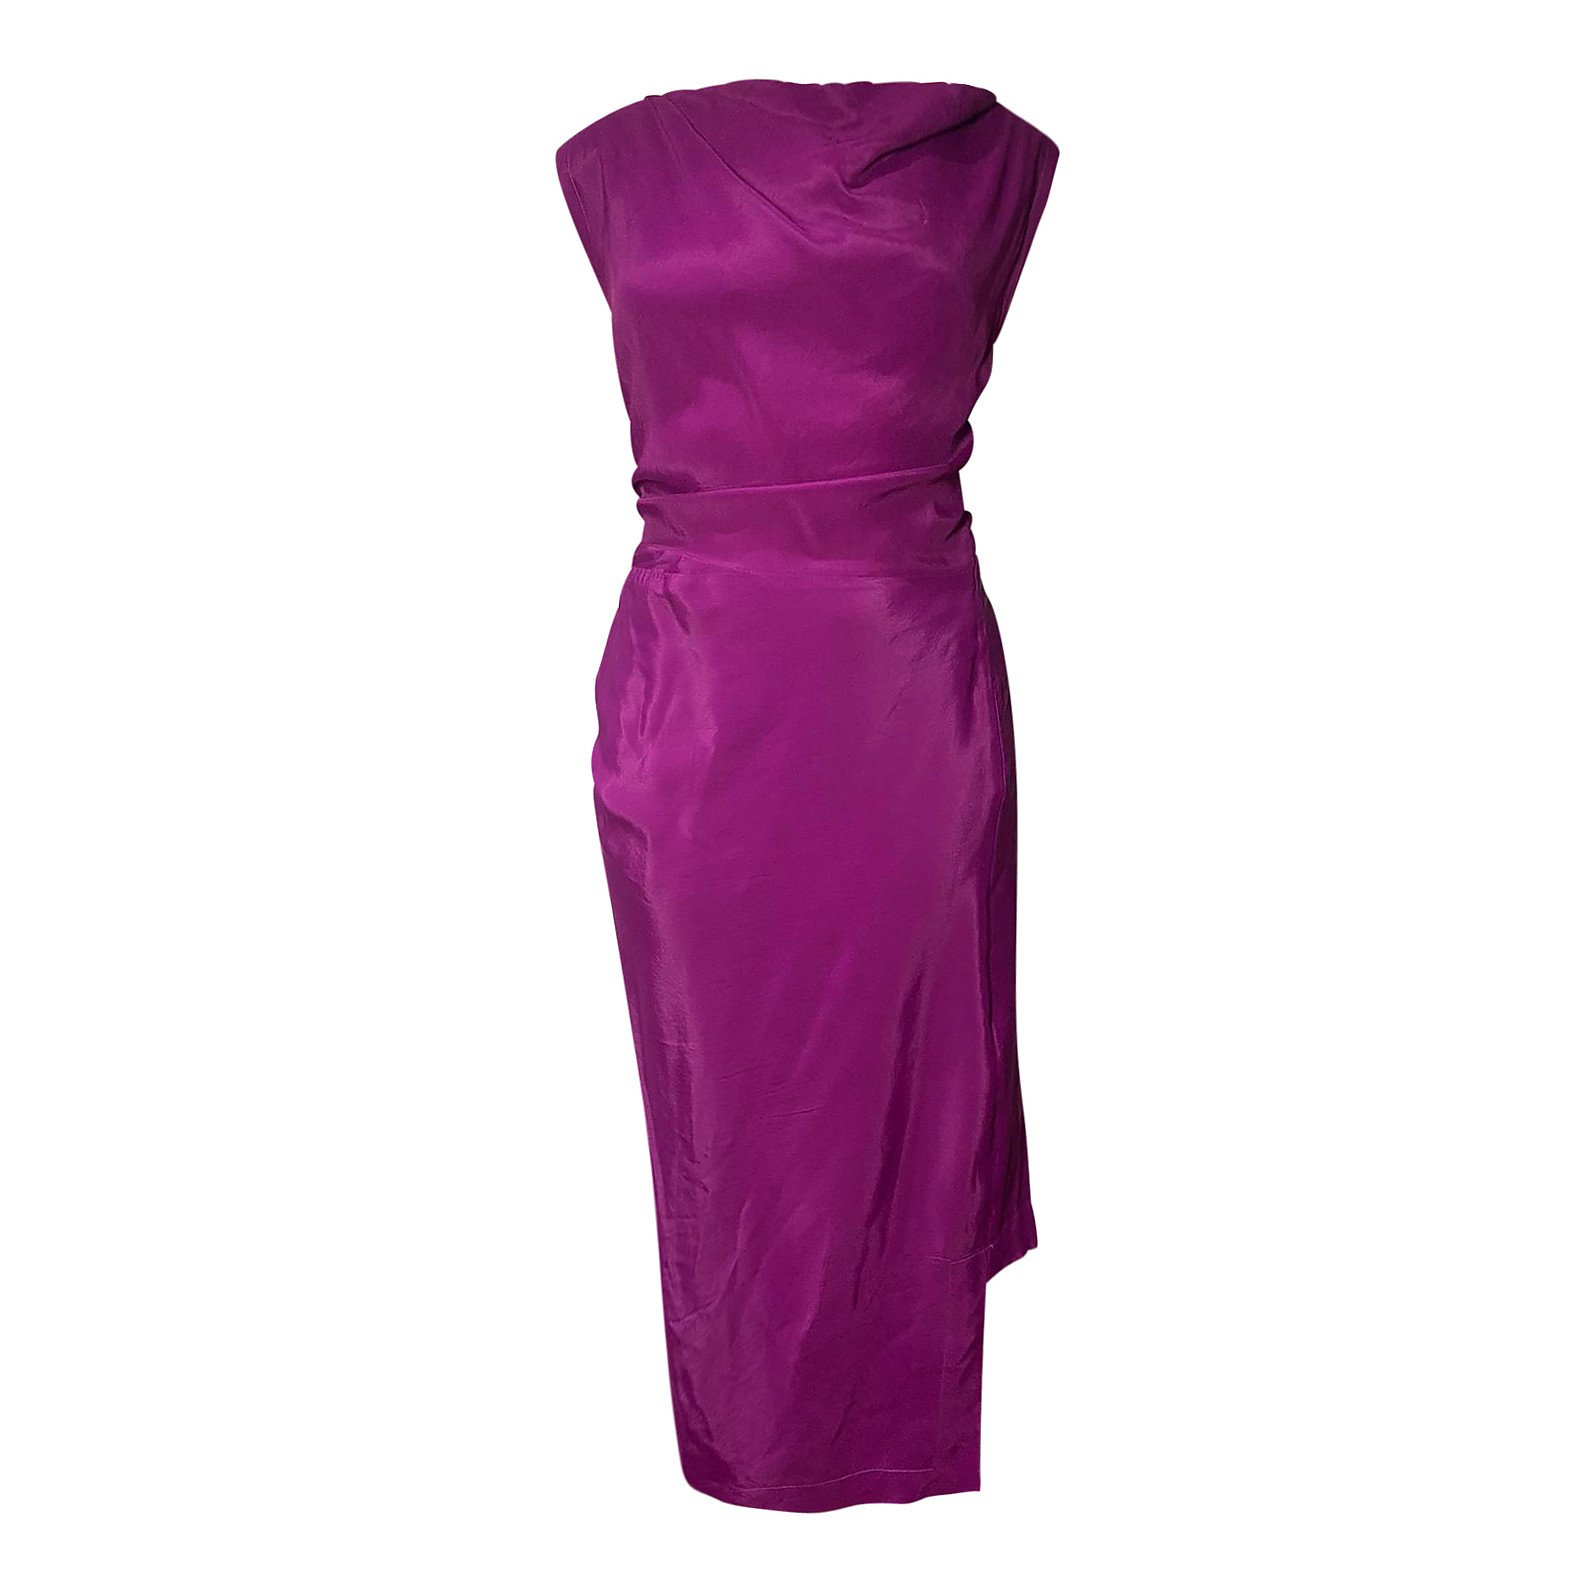 Vivienne Westwood Sleeveless Satin Dress